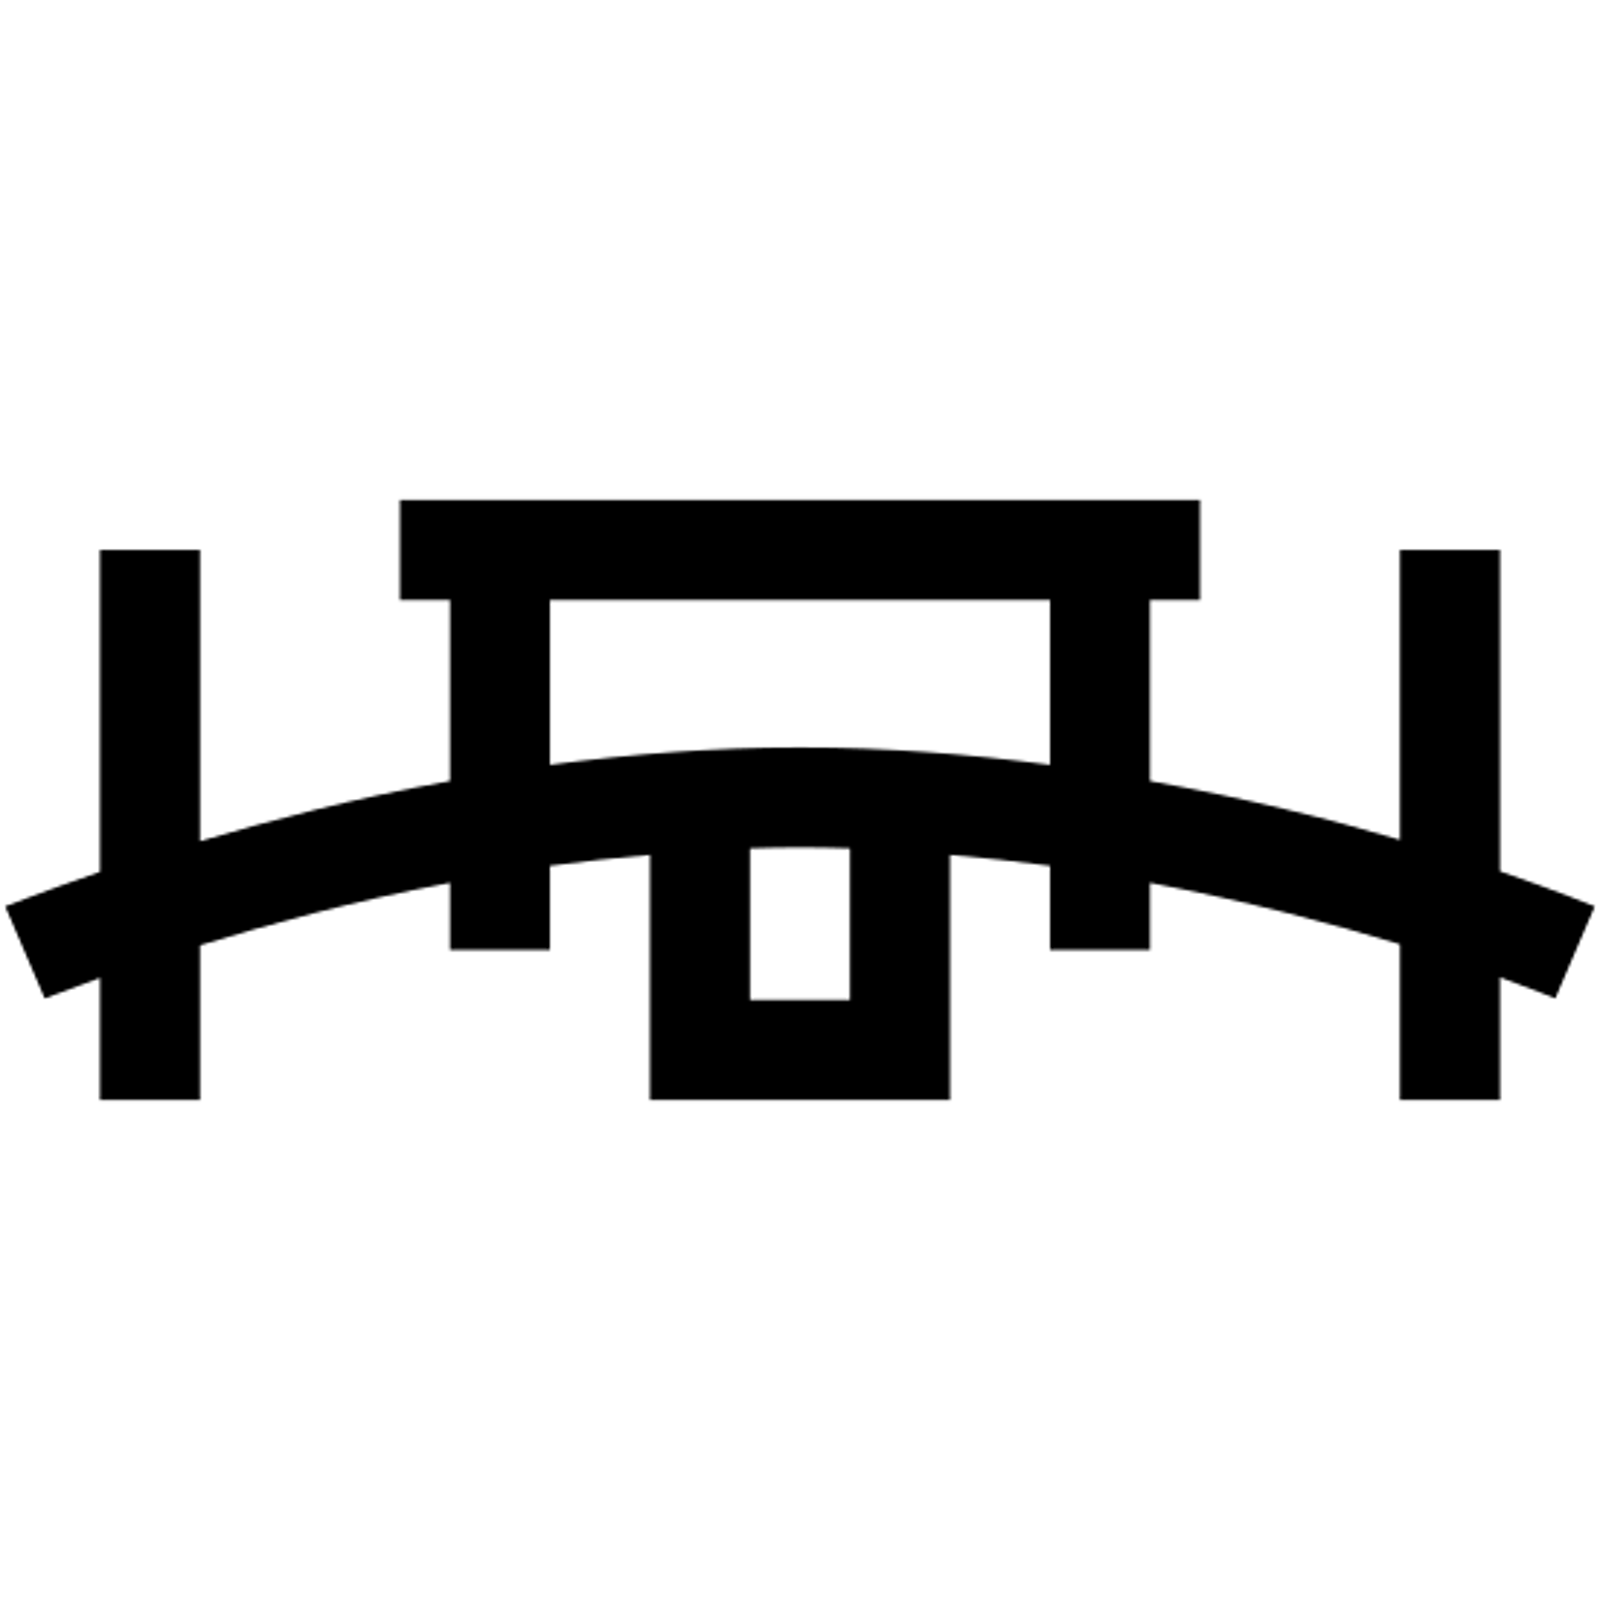 Ovality Sensor icon